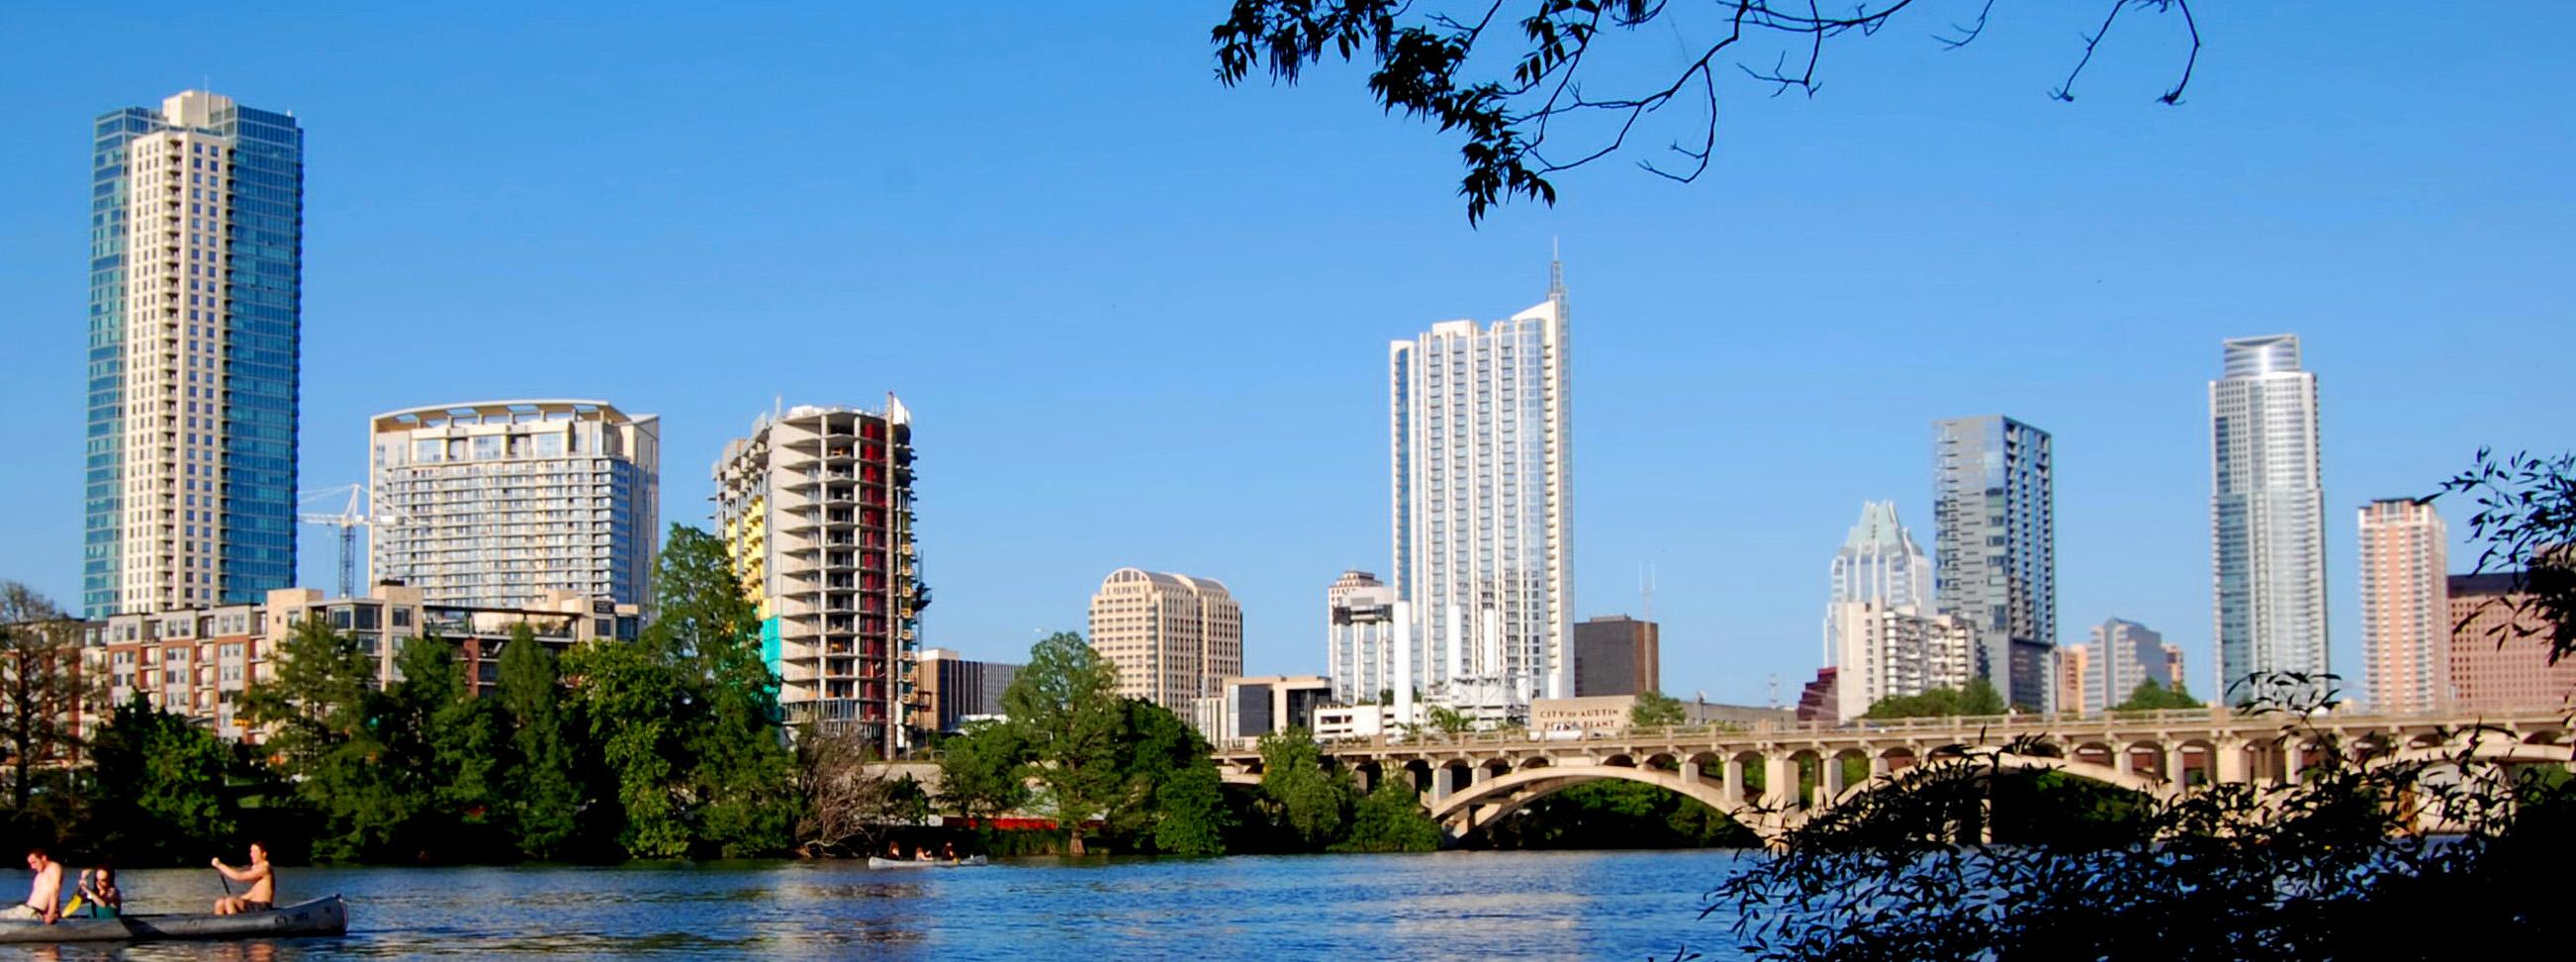 Austin_Skyline_April_2013